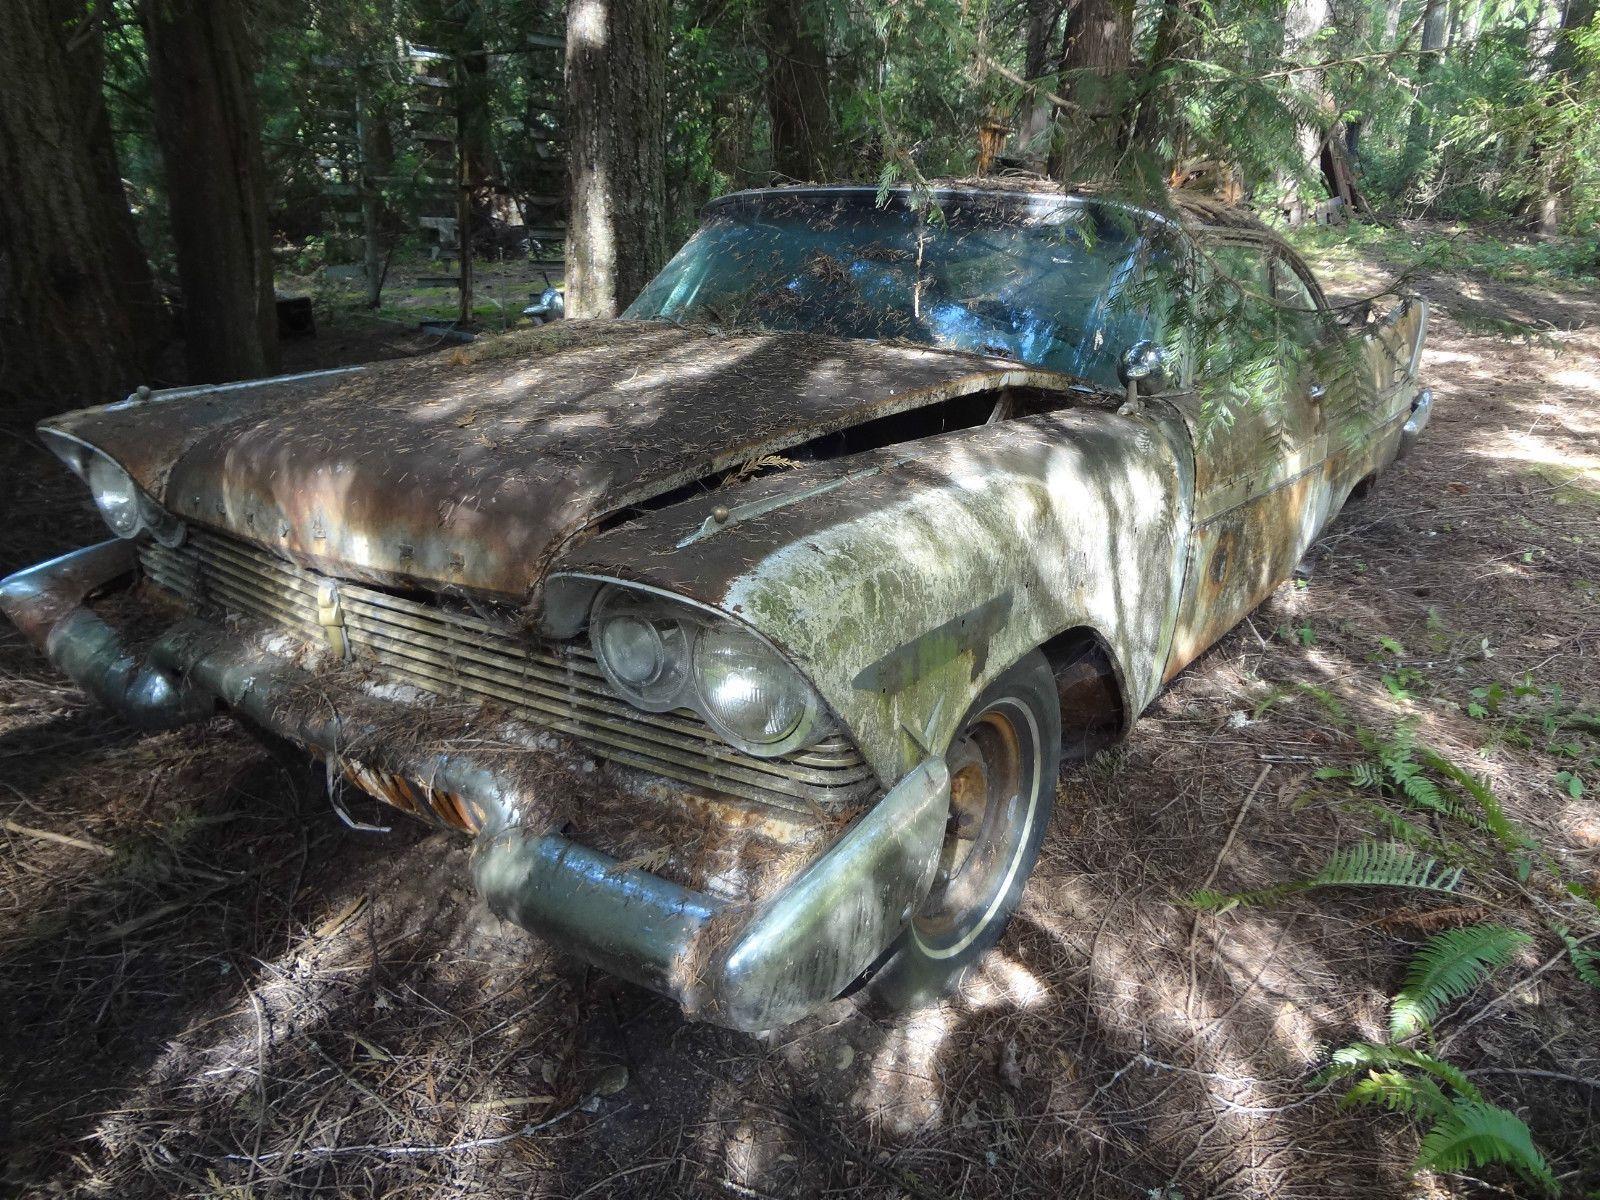 Plymouth Fury Parts or Restoration | eBay | Christine | Pinterest ...